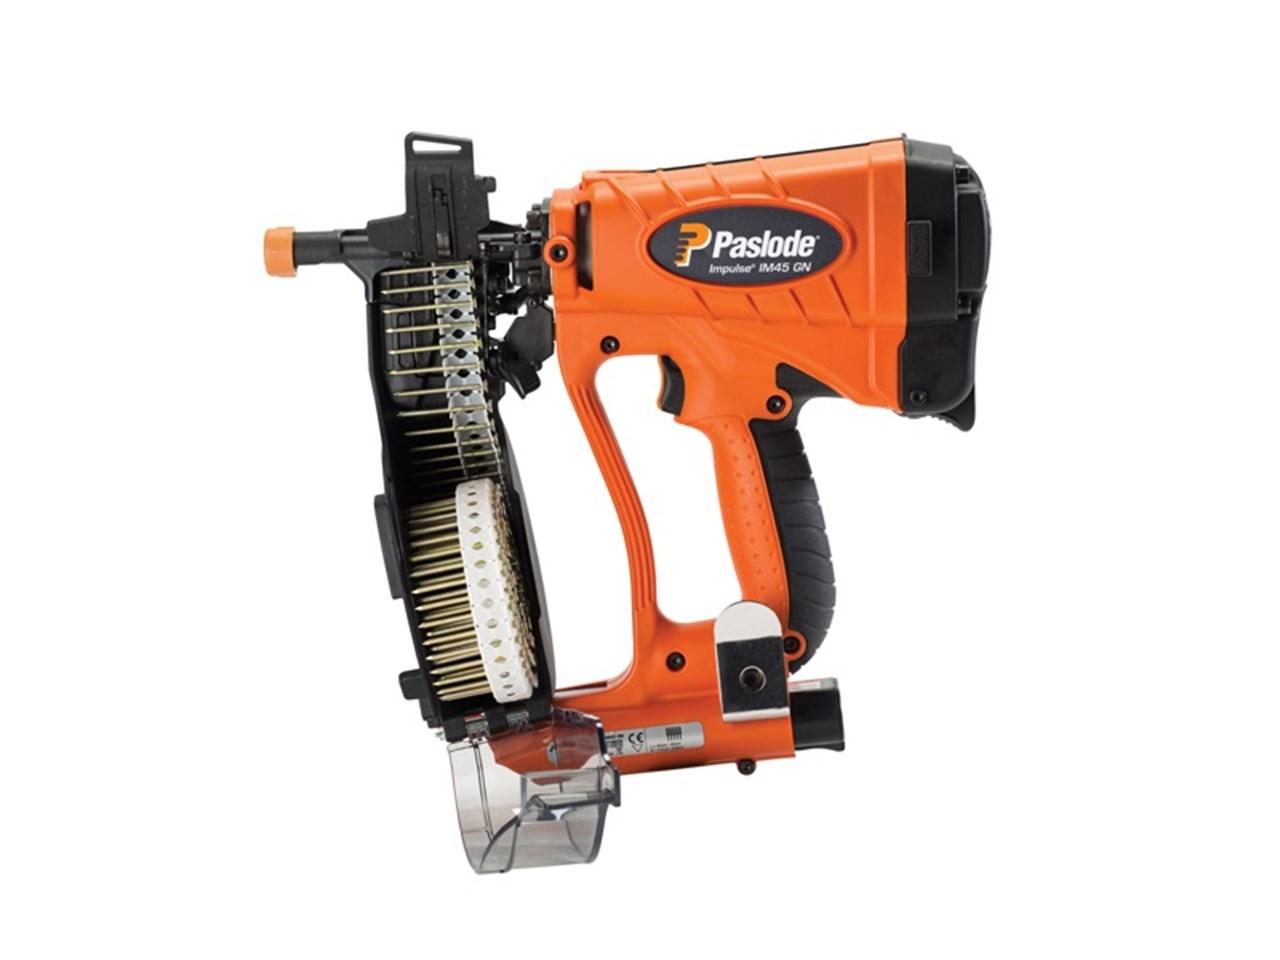 Paslode IM45GN Multi Purpose Plastic Coil Nailer / Nail Gun